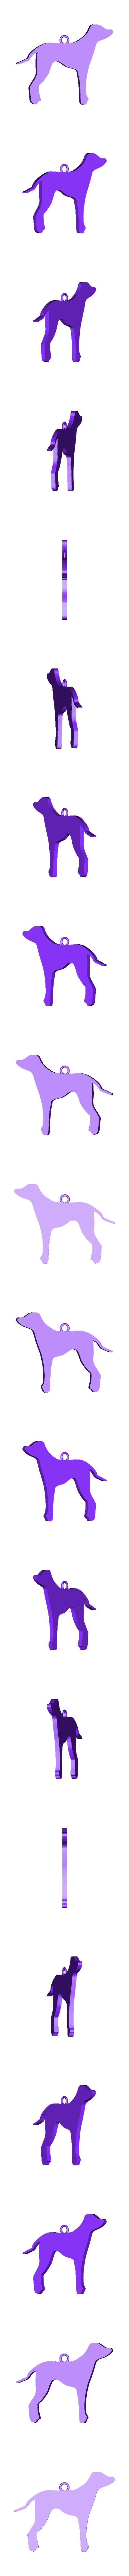 30.stl Download STL file Dogs • 3D printing object, GENNADI3313